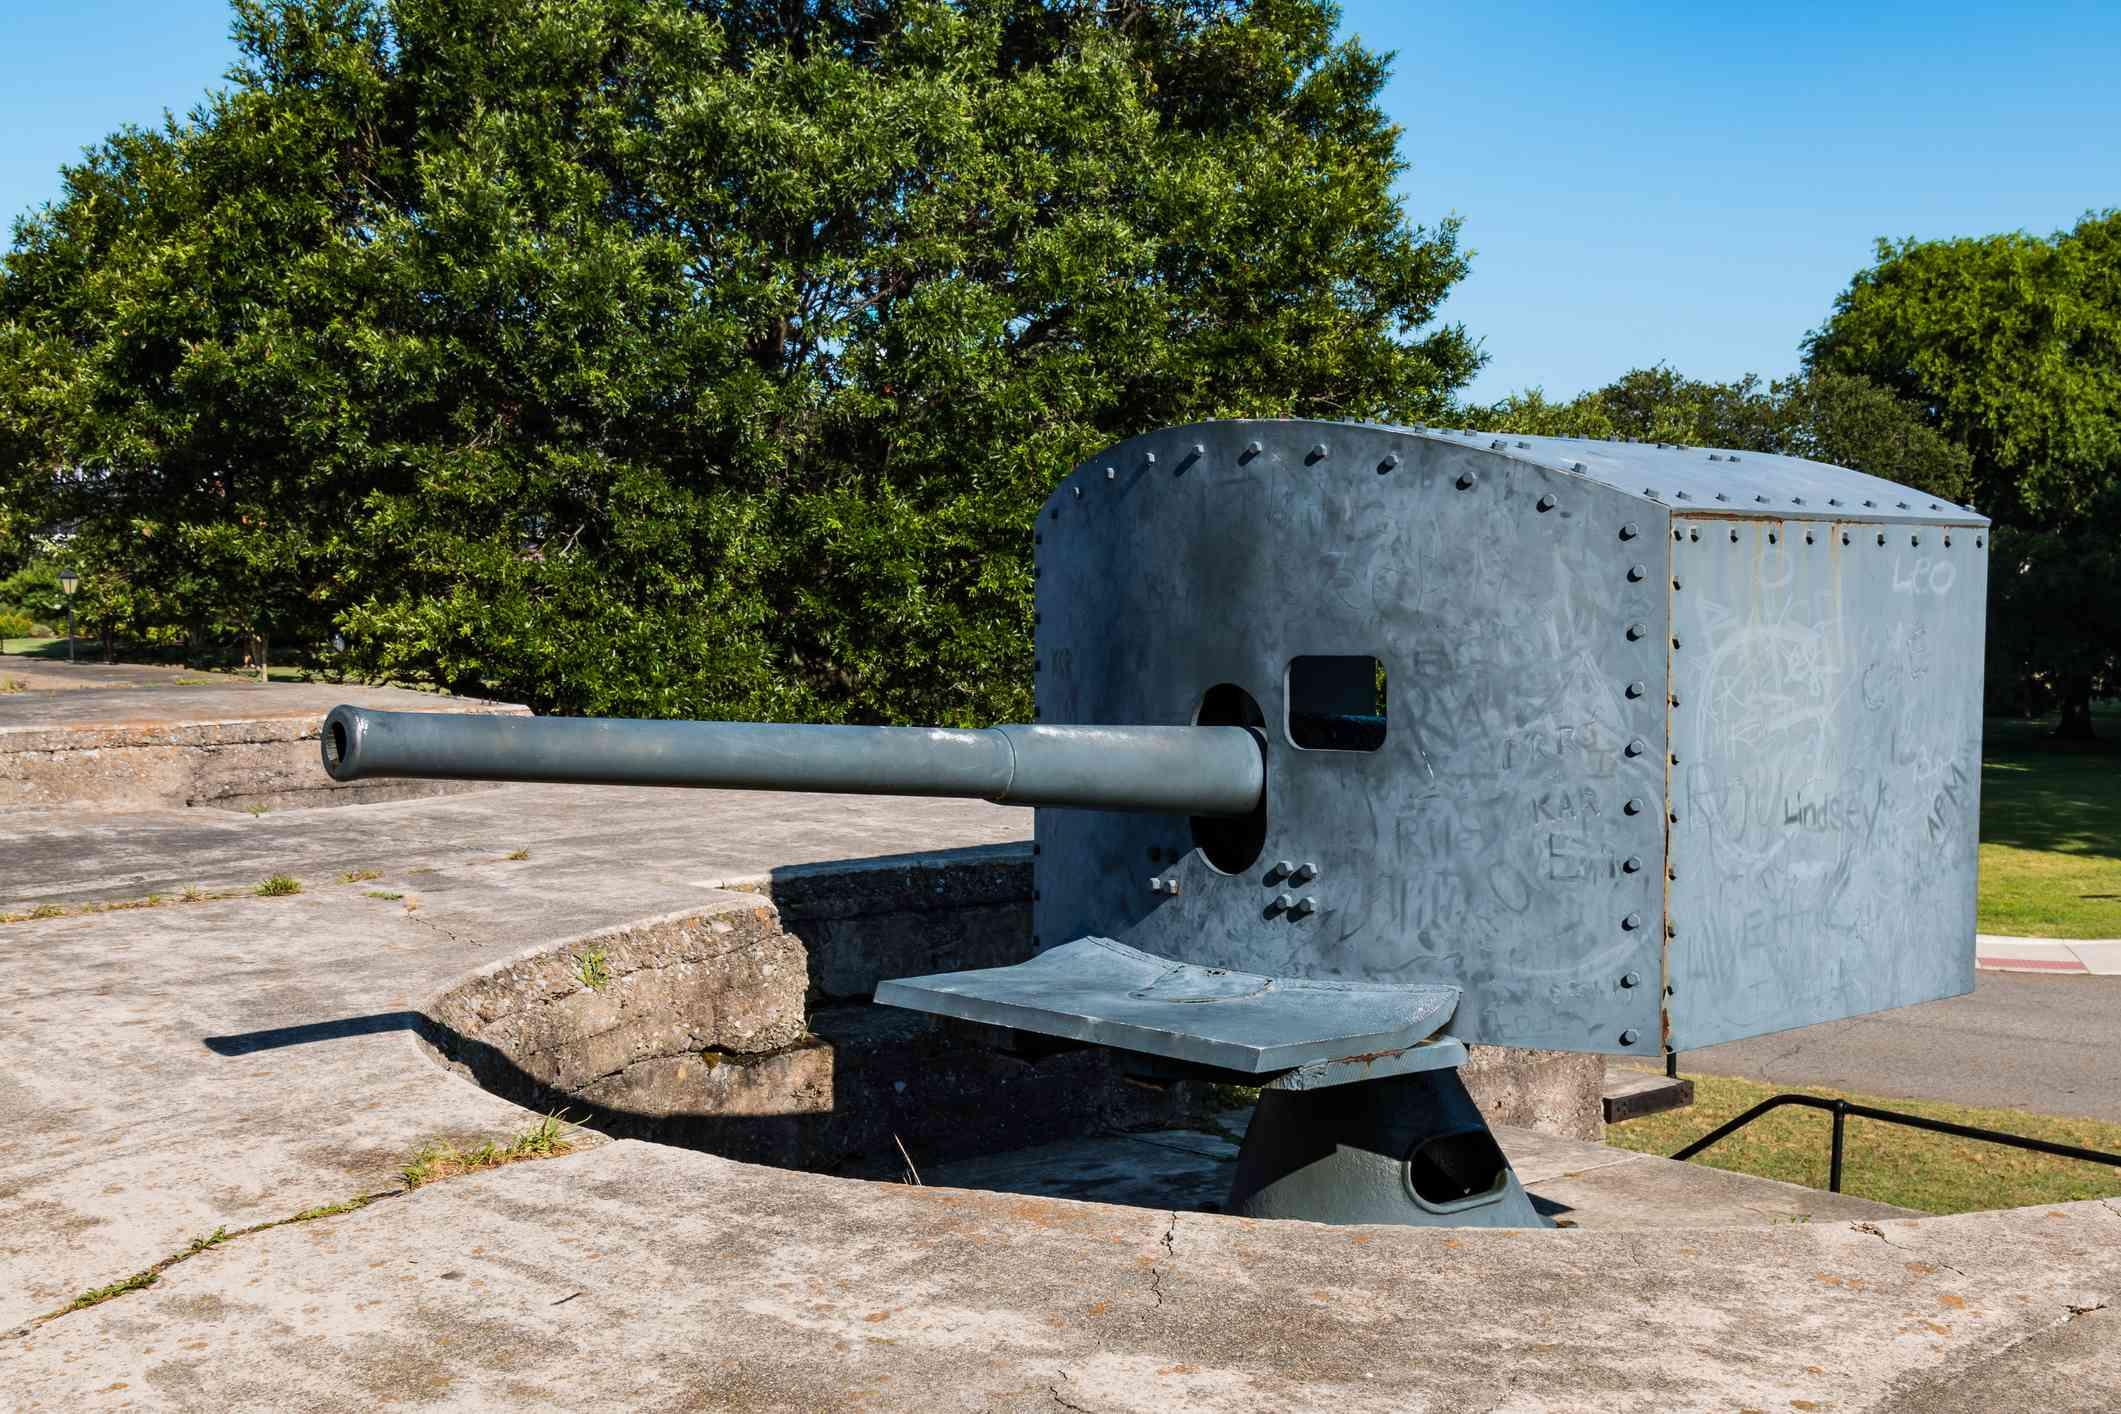 Antique Rapid-Fire Gun at Fort Monroe in Hampton, VA